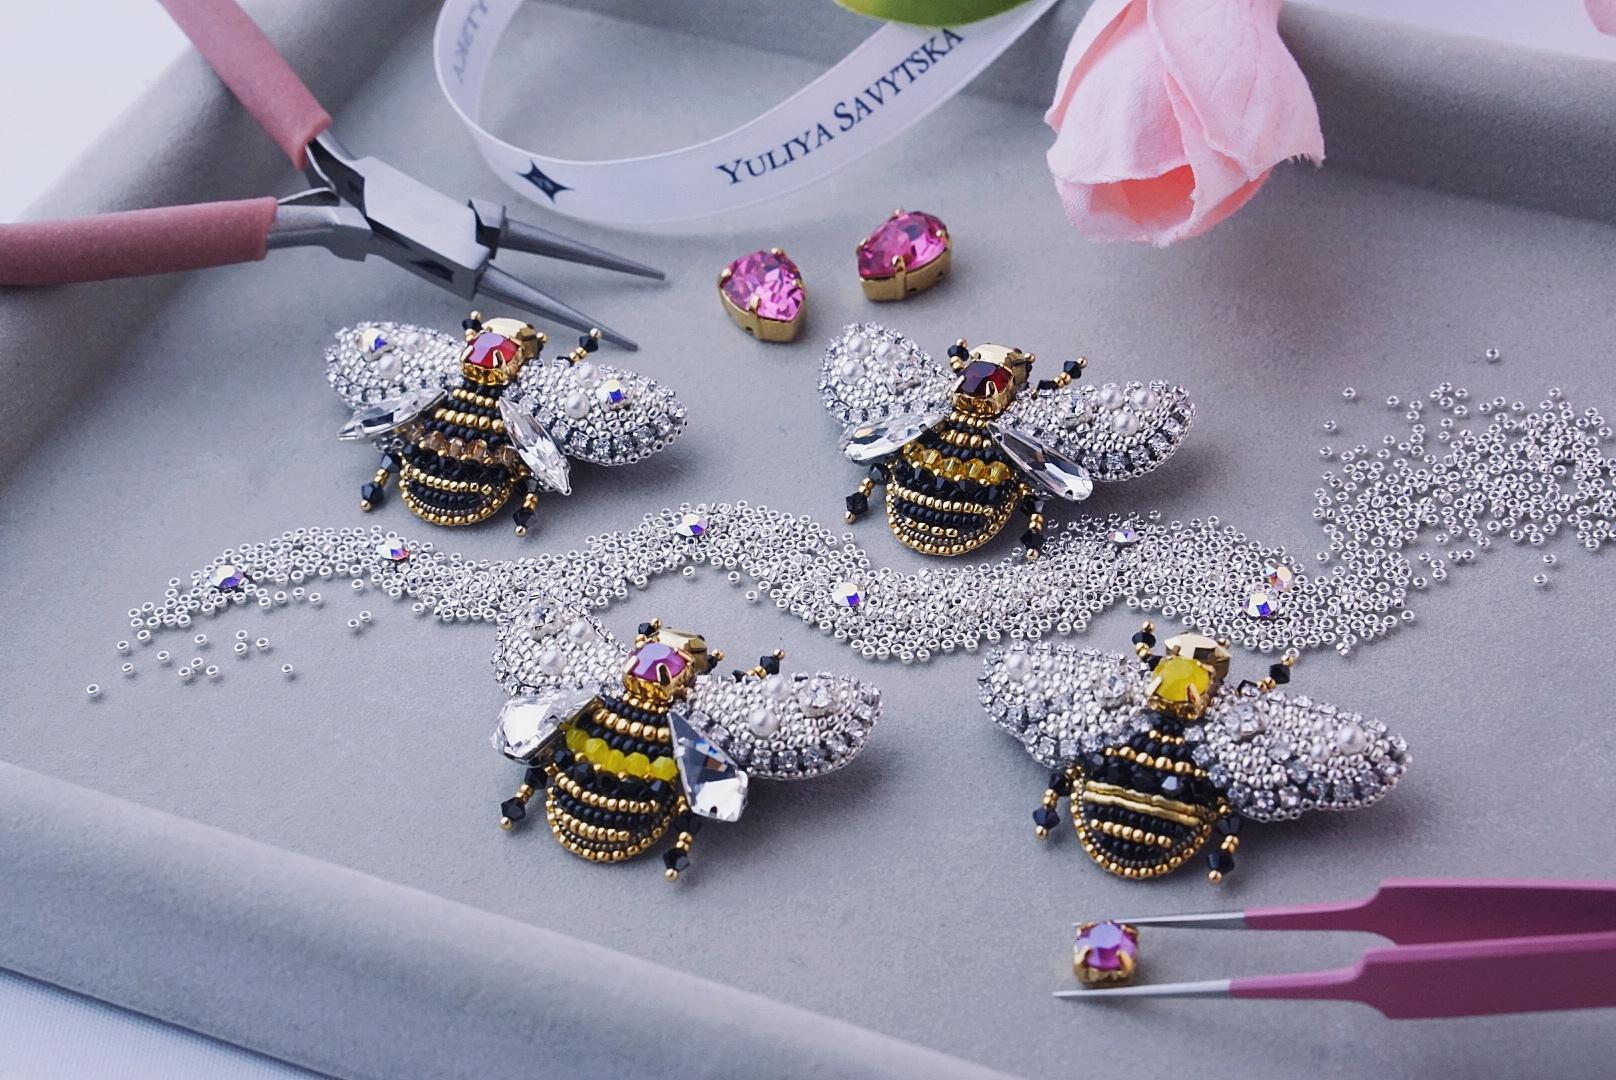 Paradise Bees Jewellery Collection by Yuliya Savytska YS